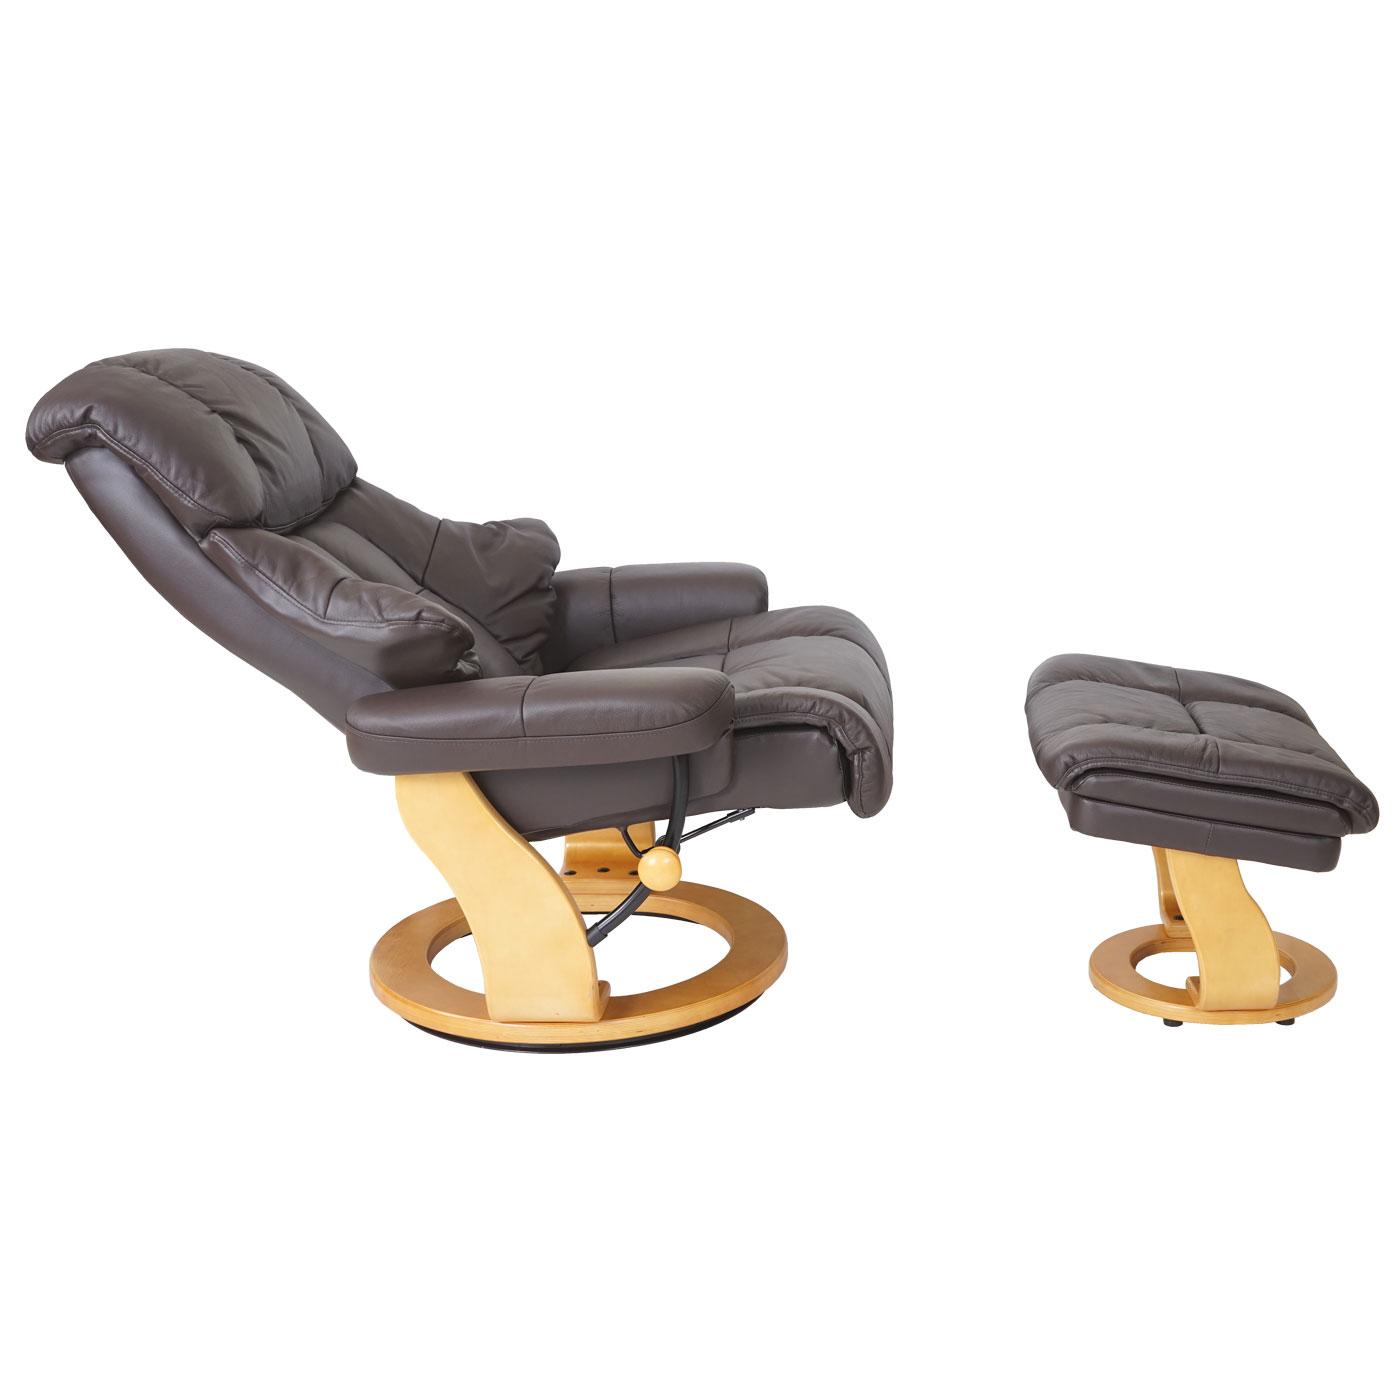 leder xxl relaxsessel tv sessel hocker 180kg belastb fernsehsessel braun 56054 ebay. Black Bedroom Furniture Sets. Home Design Ideas